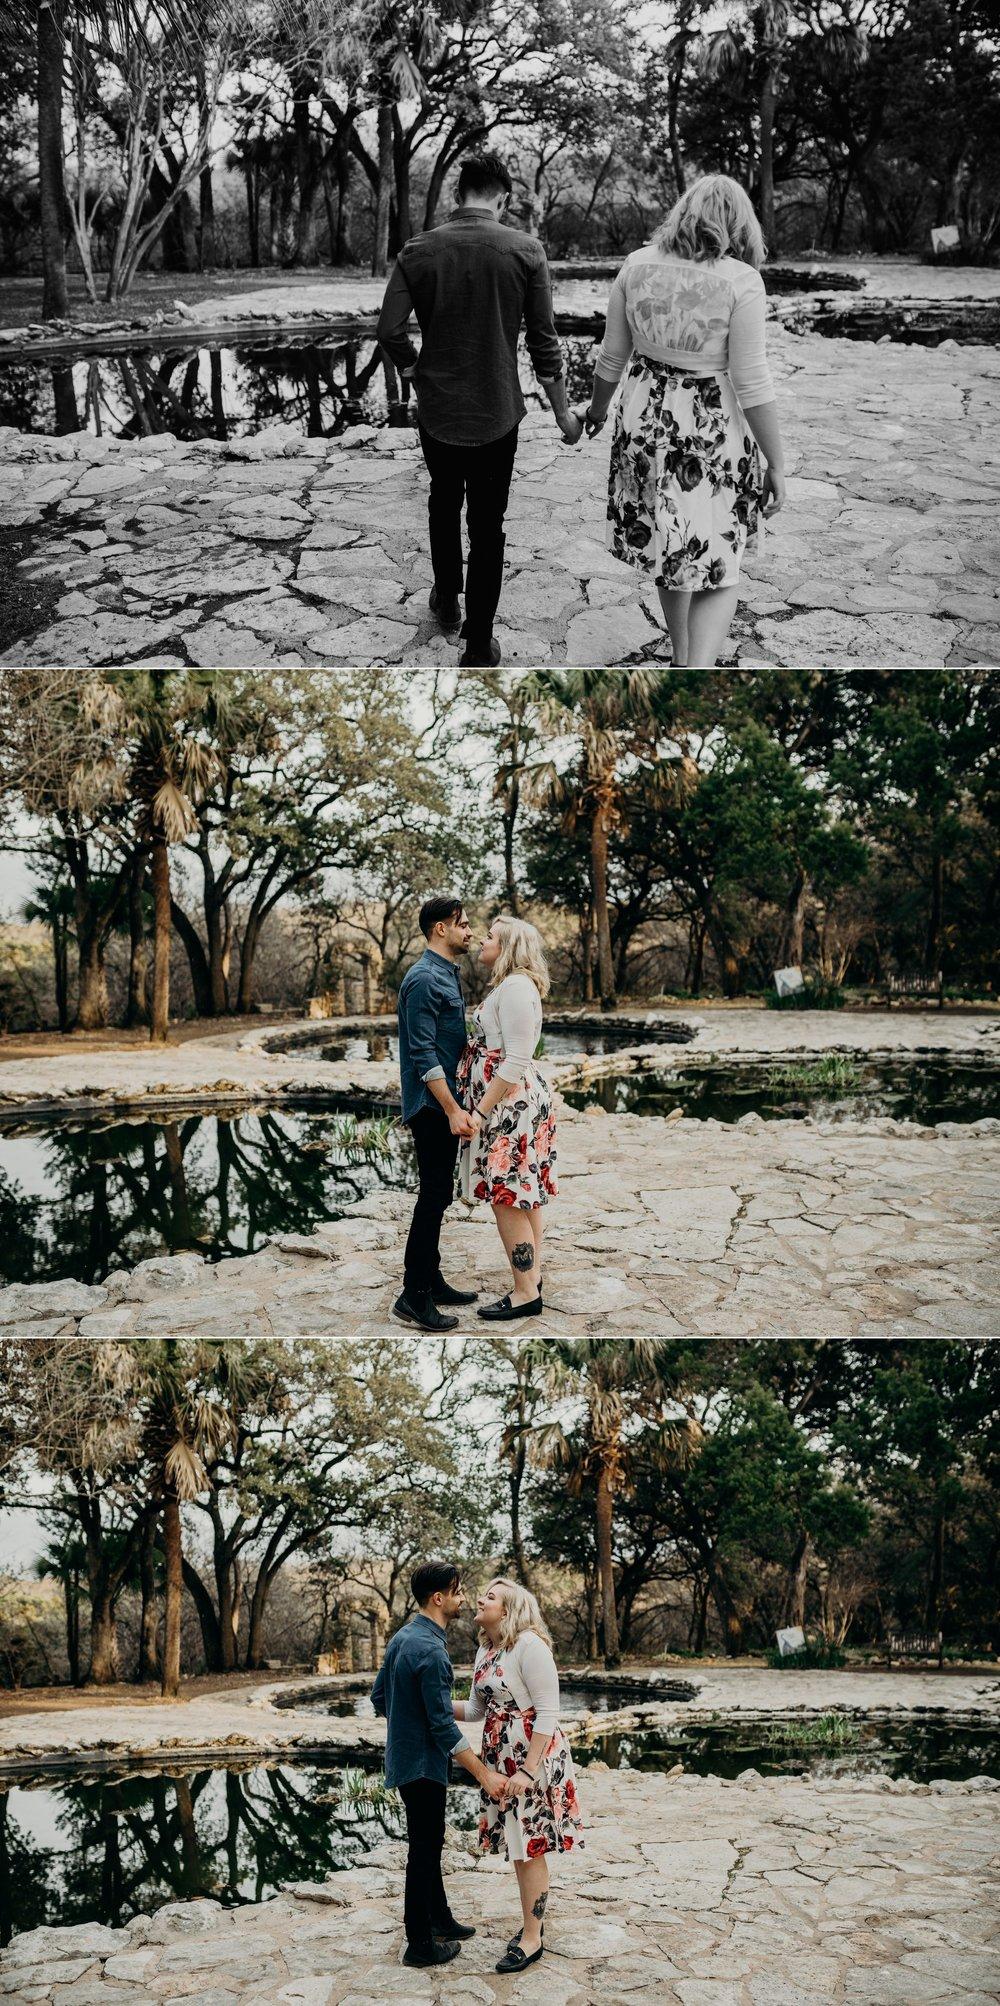 drew-andrew-texas-austin-minnesota-minneapolis-wedding-photographer-destination-elopement-intimate-adventurous_0111.jpg